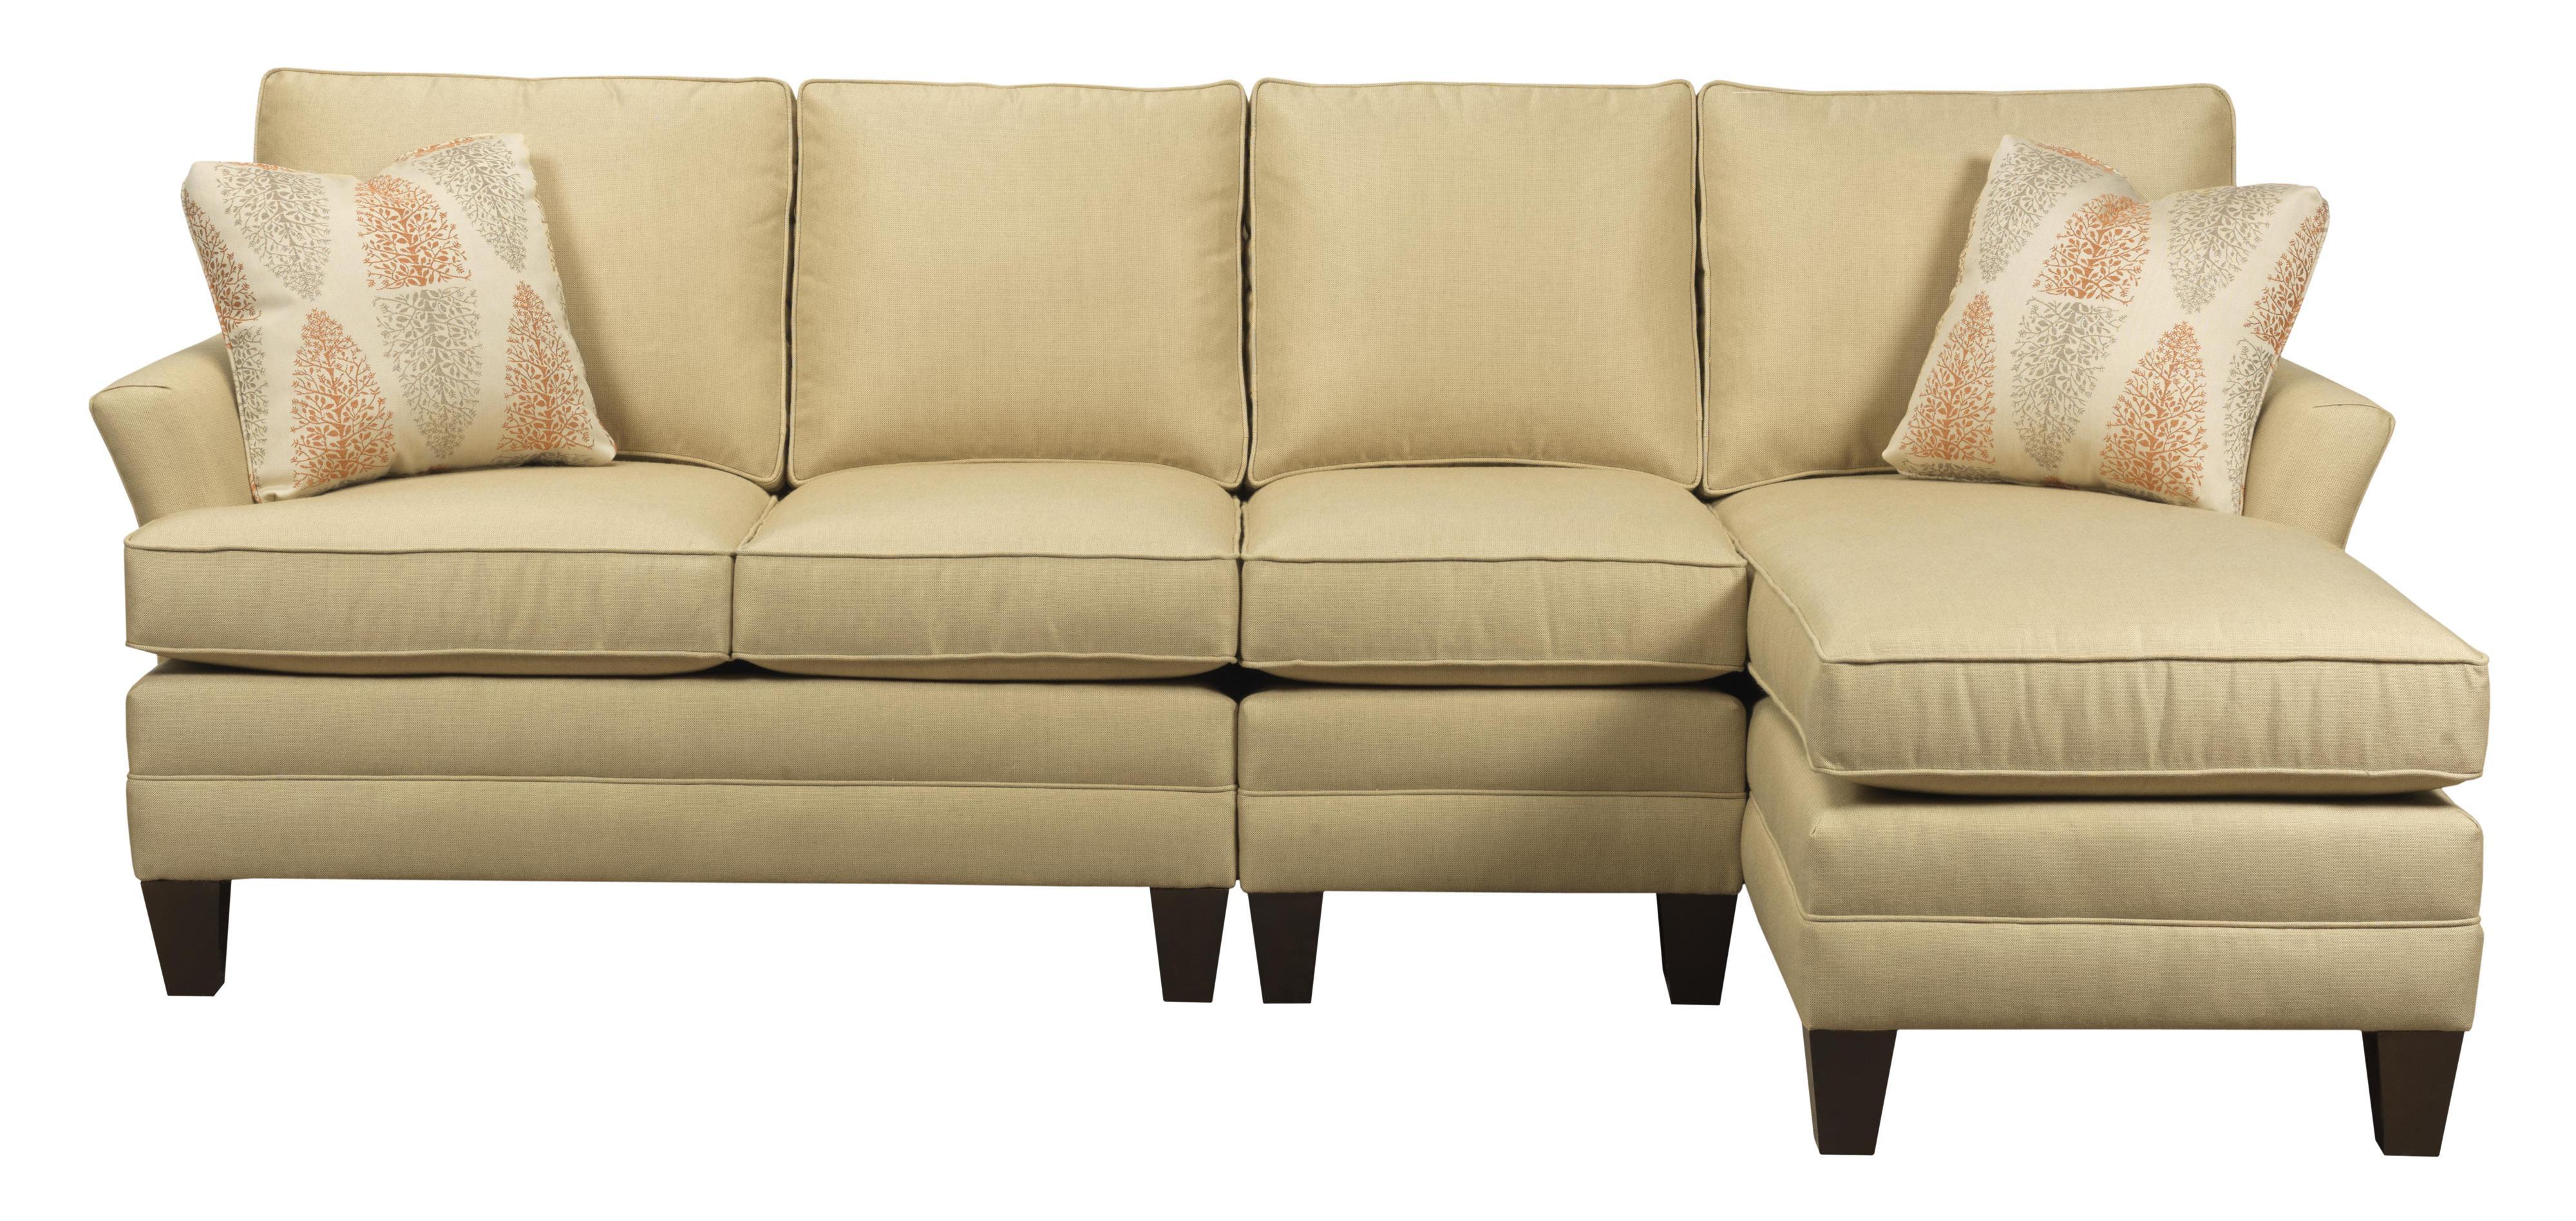 kincaid sofas reviews chic furniture studio select customizable three piece